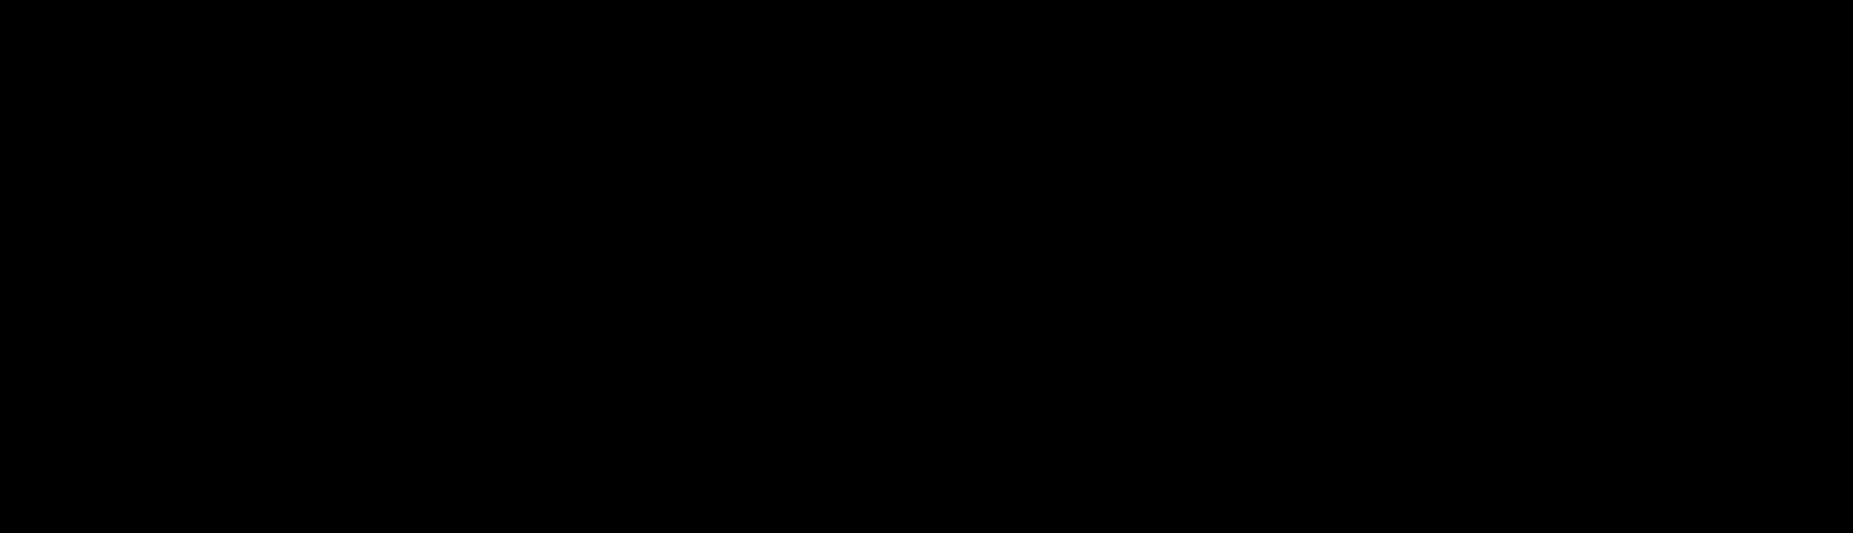 vleermuisvleugels png